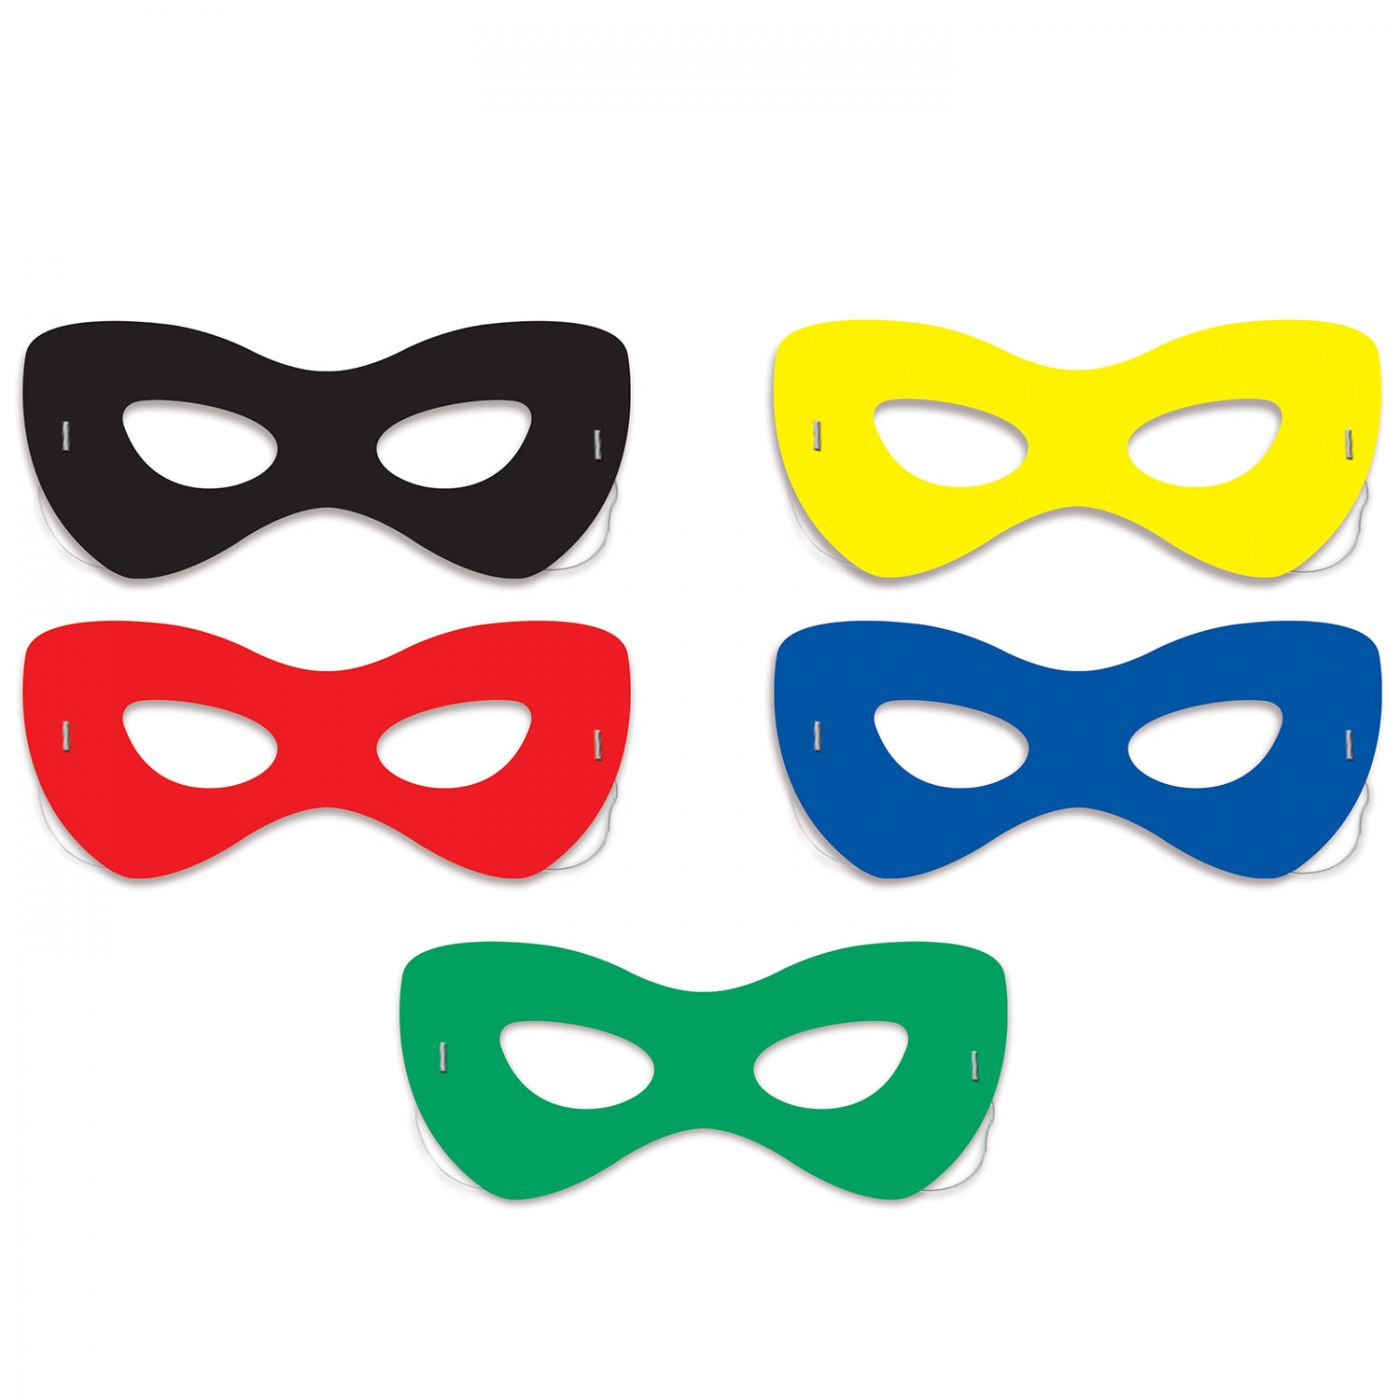 Image of Hero Half Masks